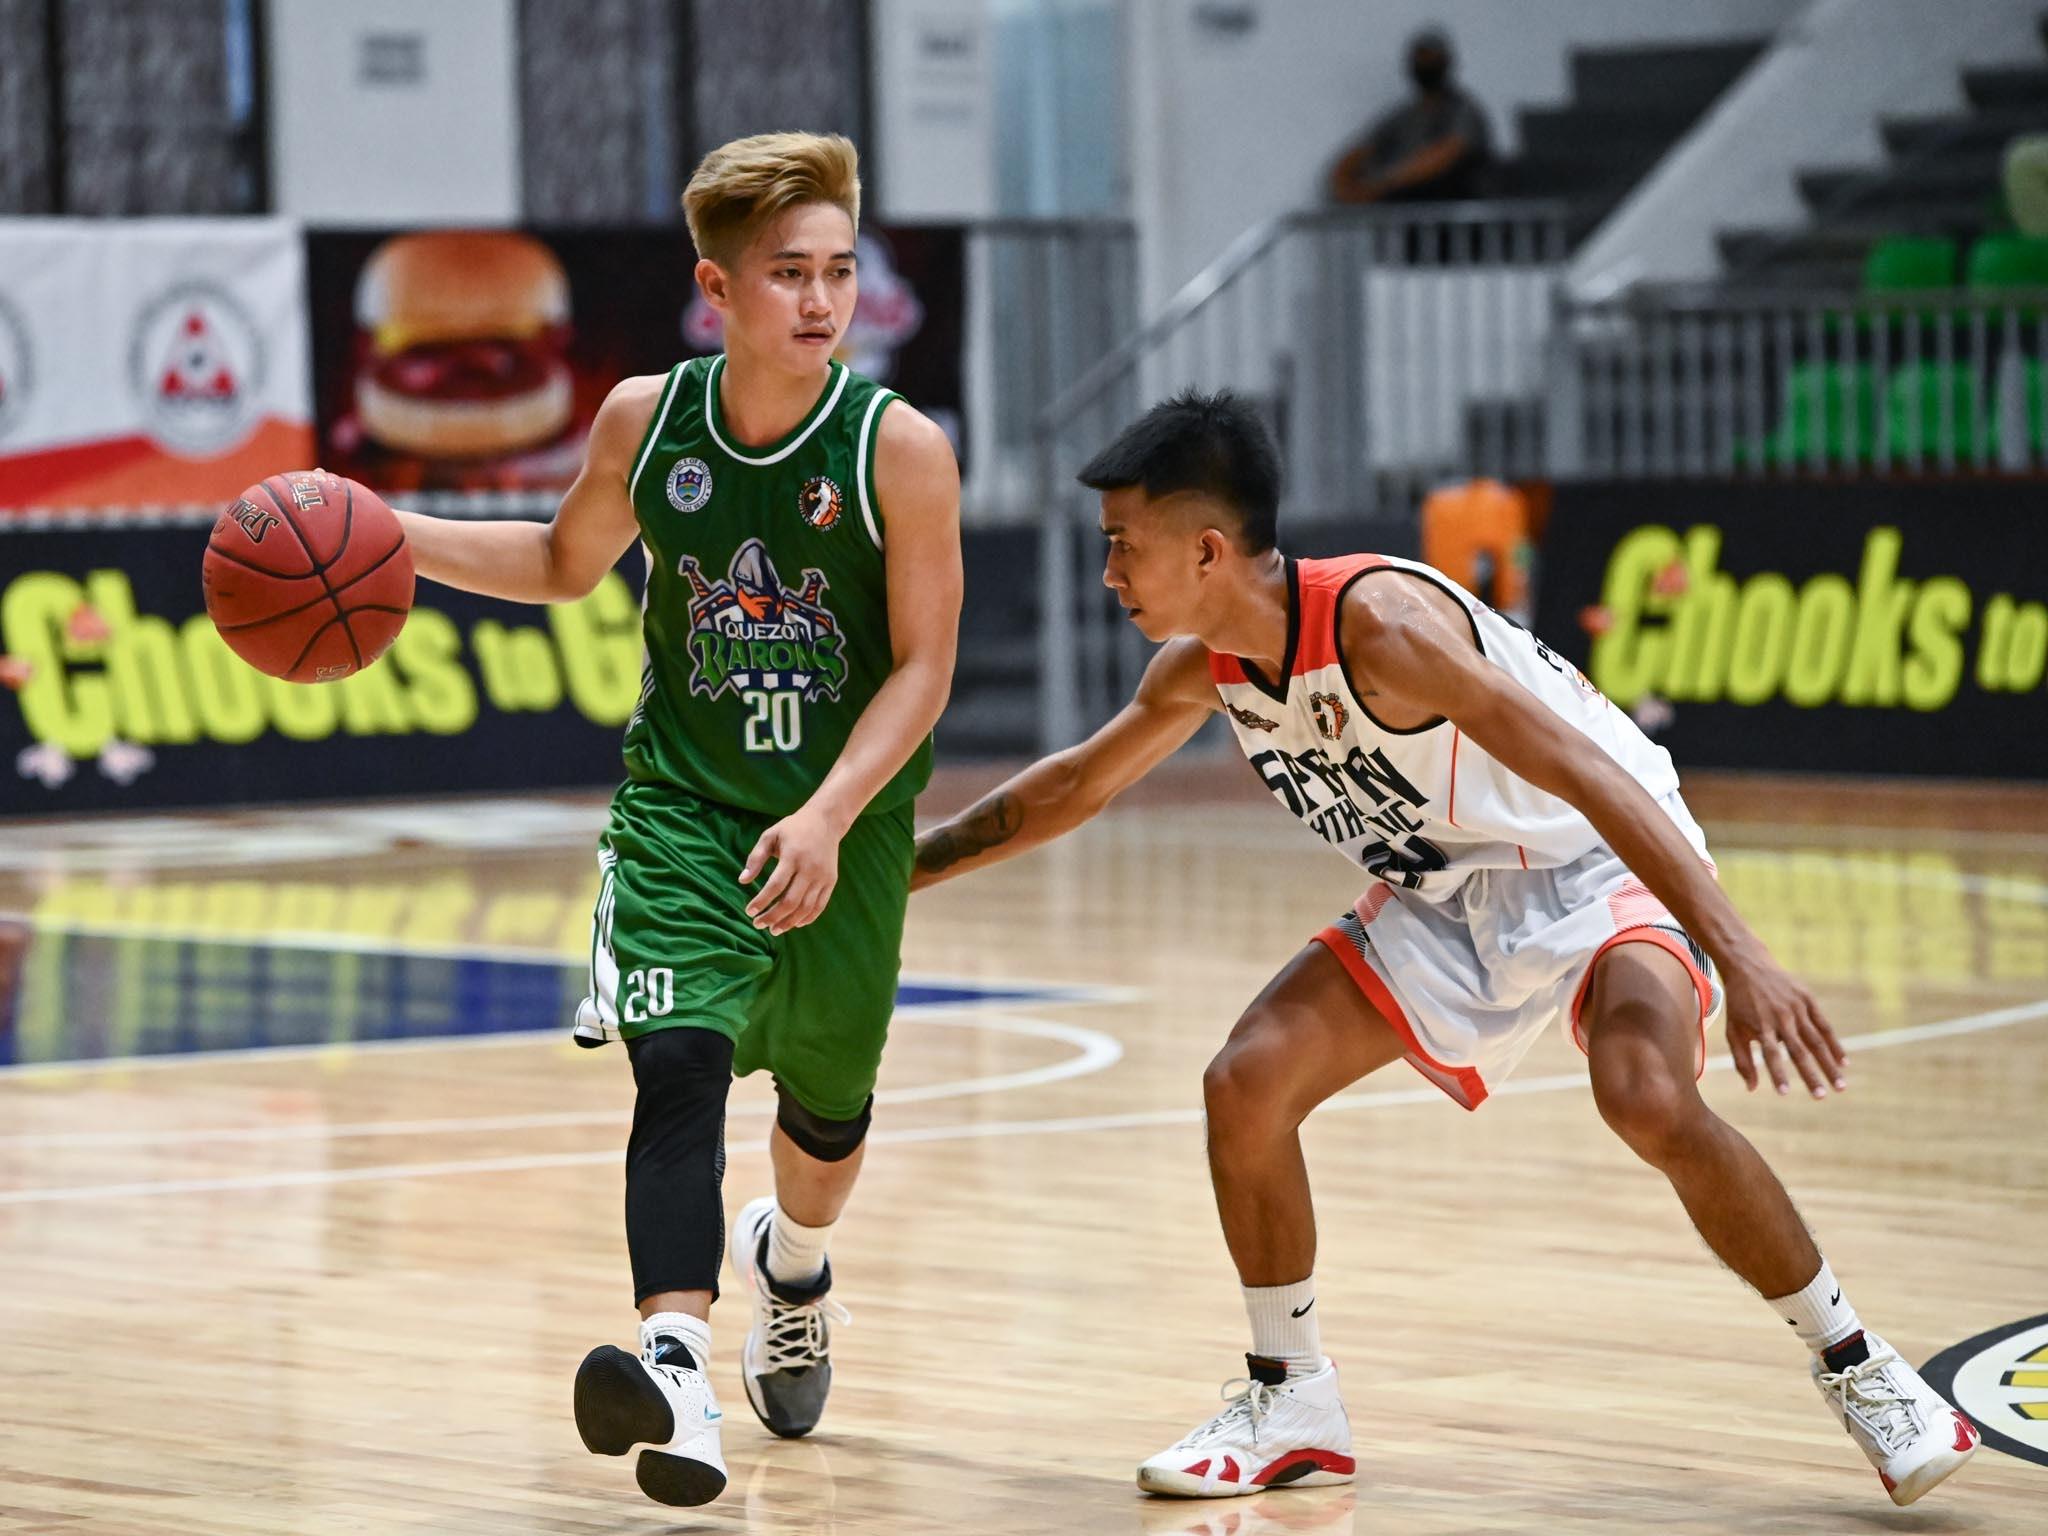 2021-Chooks-NBL-Sulong-Stan-vs-Quezon-CHRISTOPHER-LAGRAMA Barons pound Sulong Stan D4 in NBL battle of Quezon Basketball NBL News  - philippine sports news